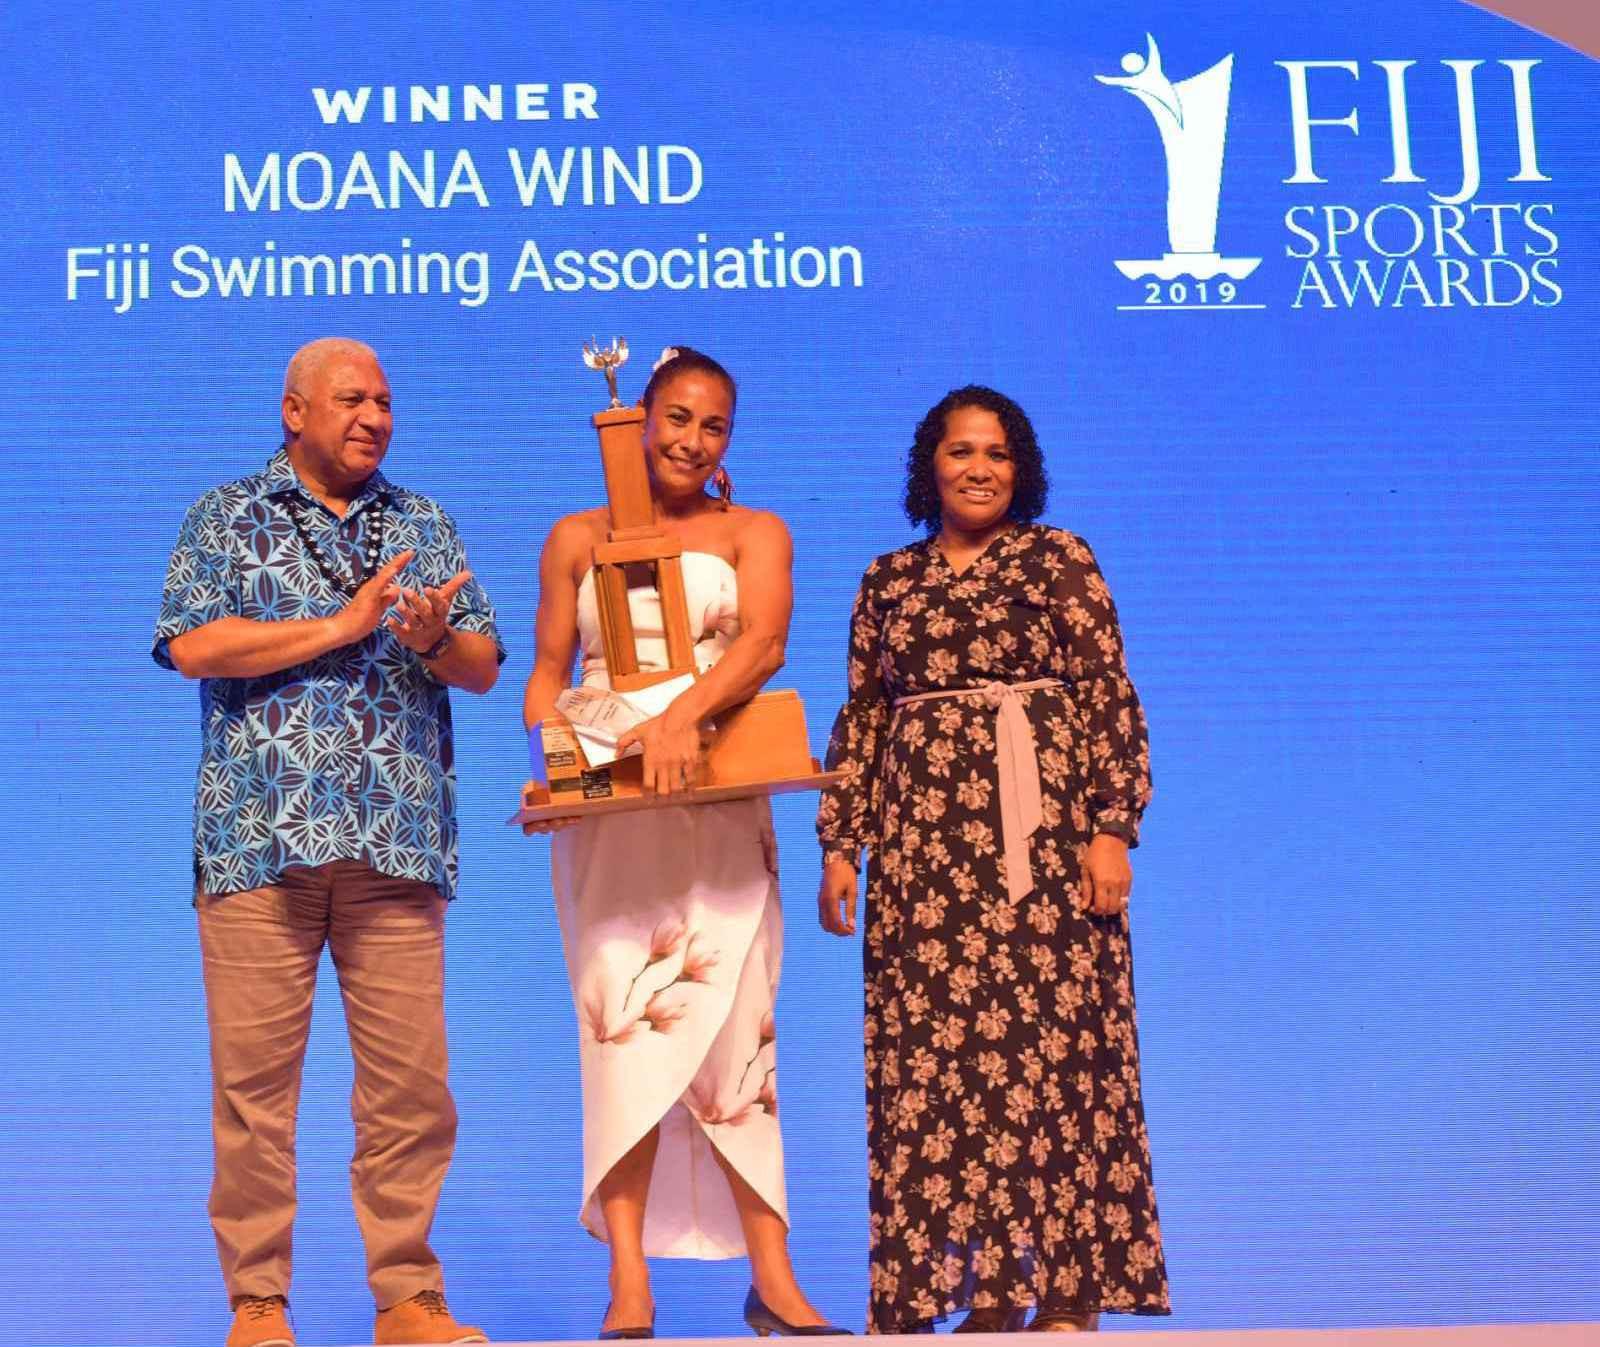 Fiji Sports Awards cancelled following COVID-19 disruption